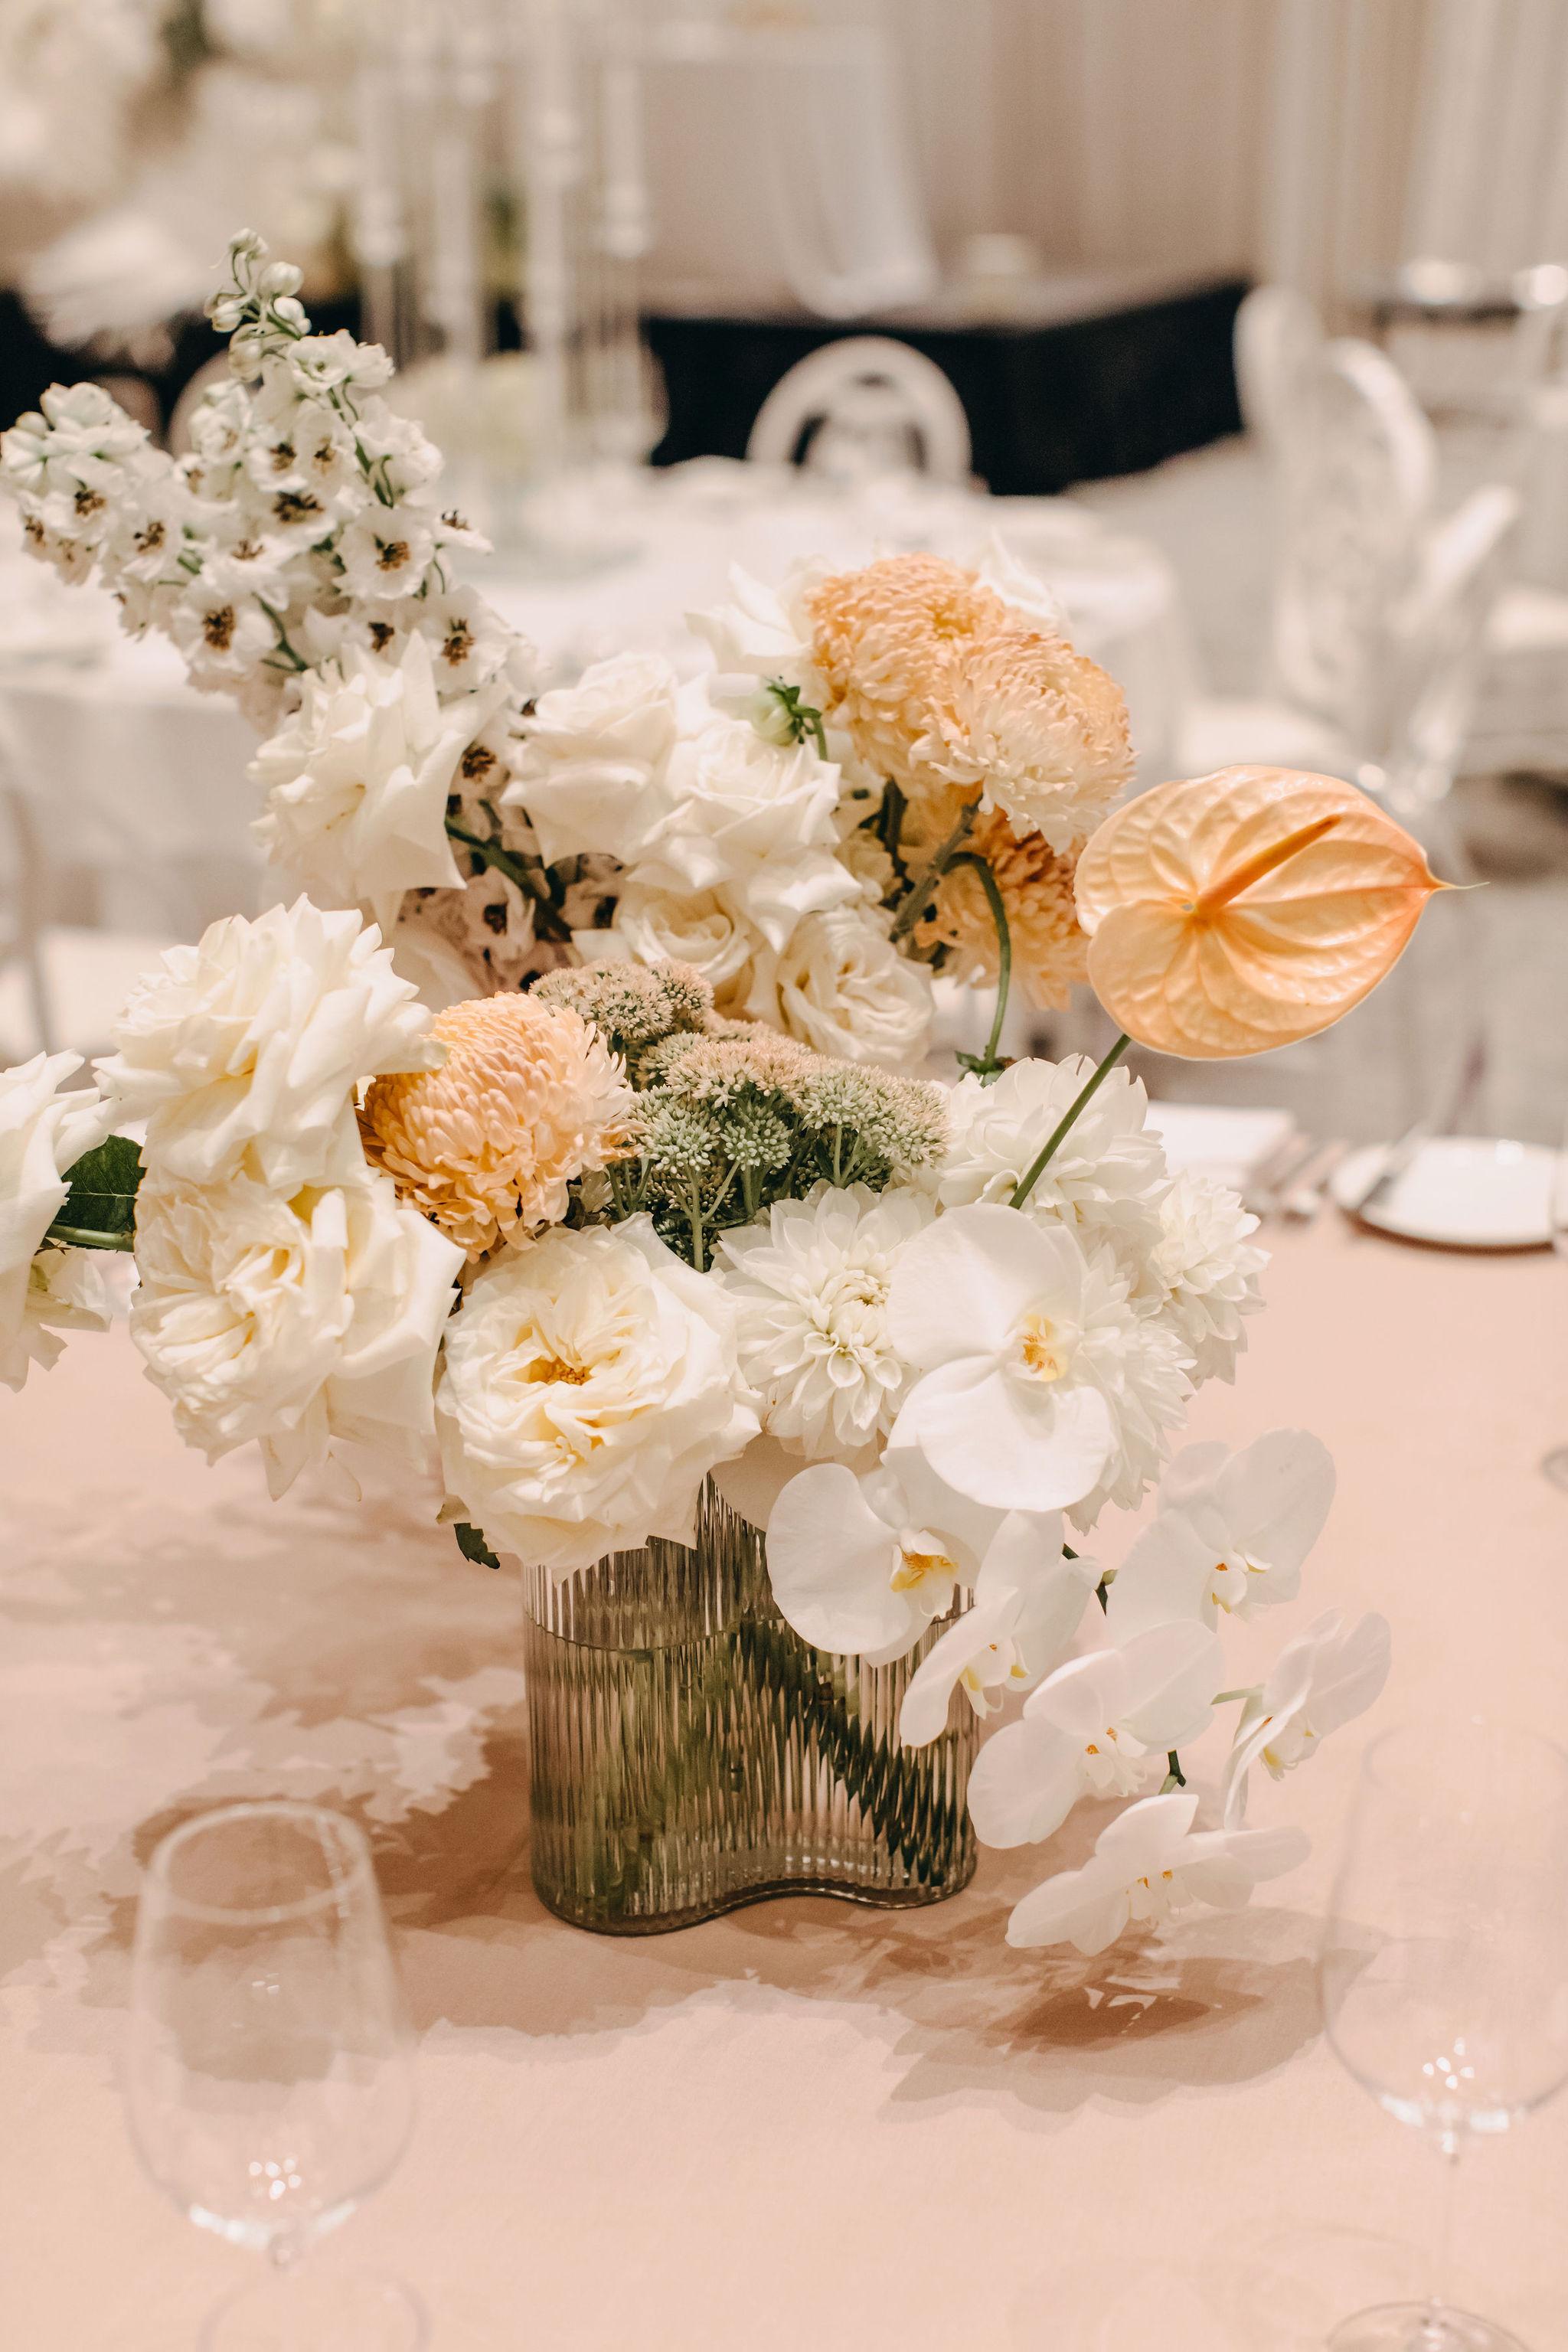 73-FOX&RABBIT-WEDDINGOPENDAY-THEWESTIN-15FEB2020